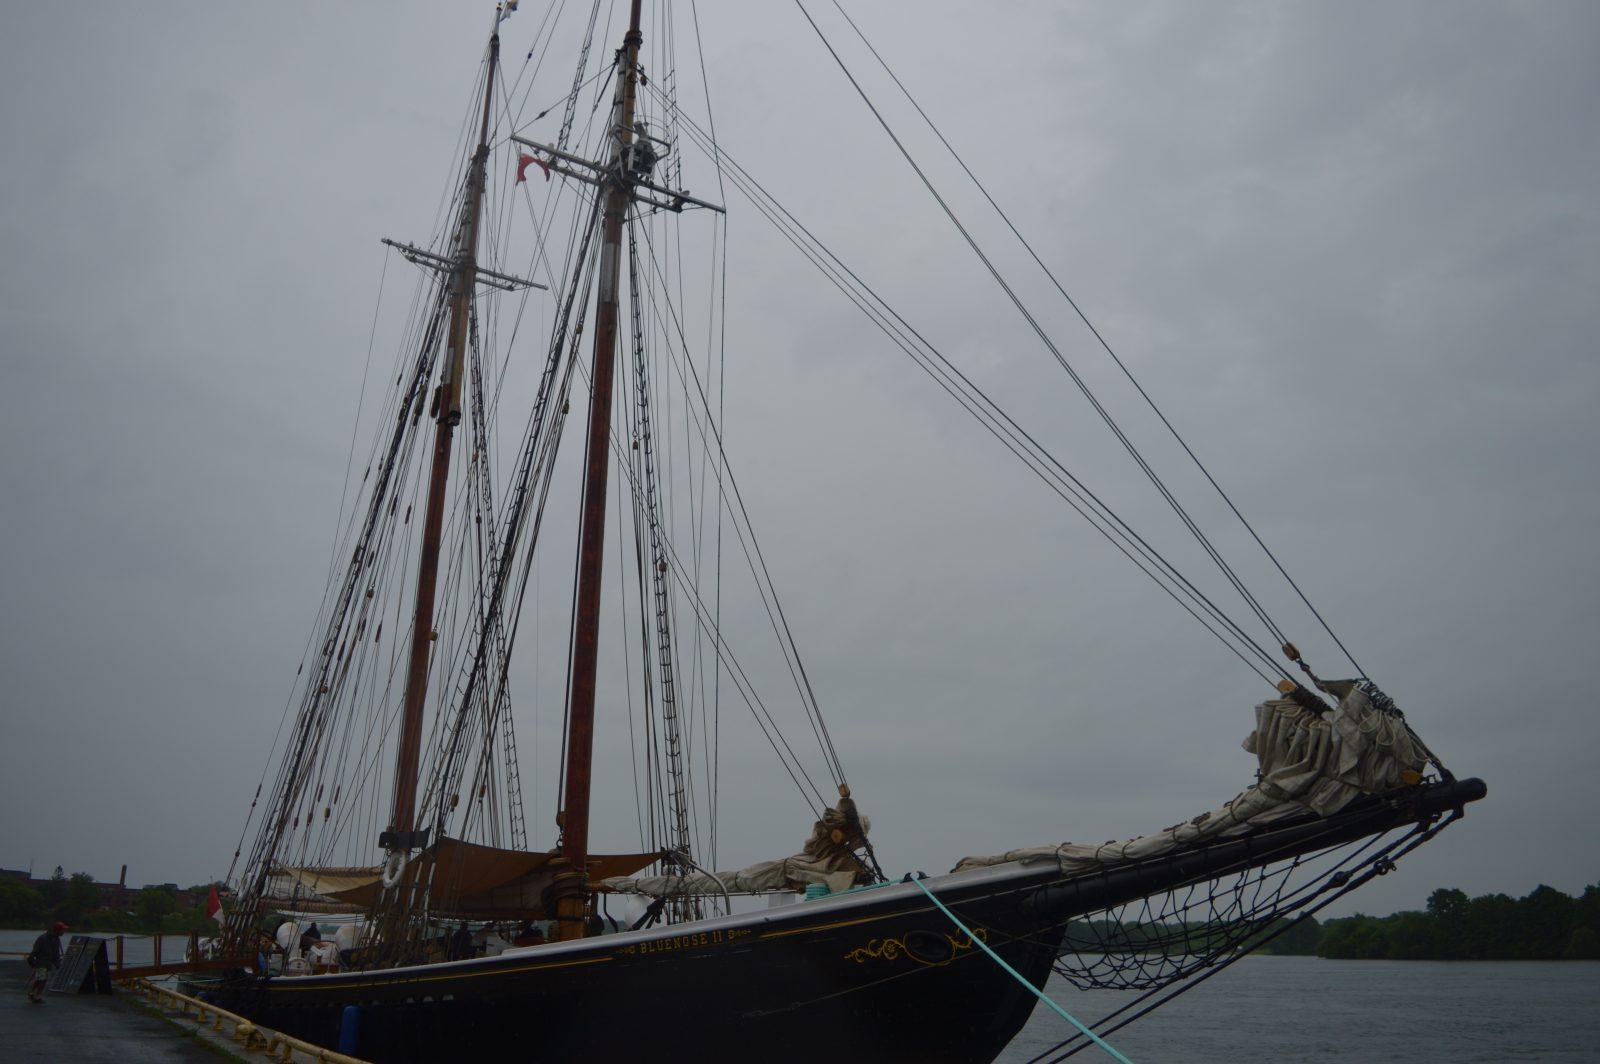 Bluenose II docks at Cornwall harbourfront